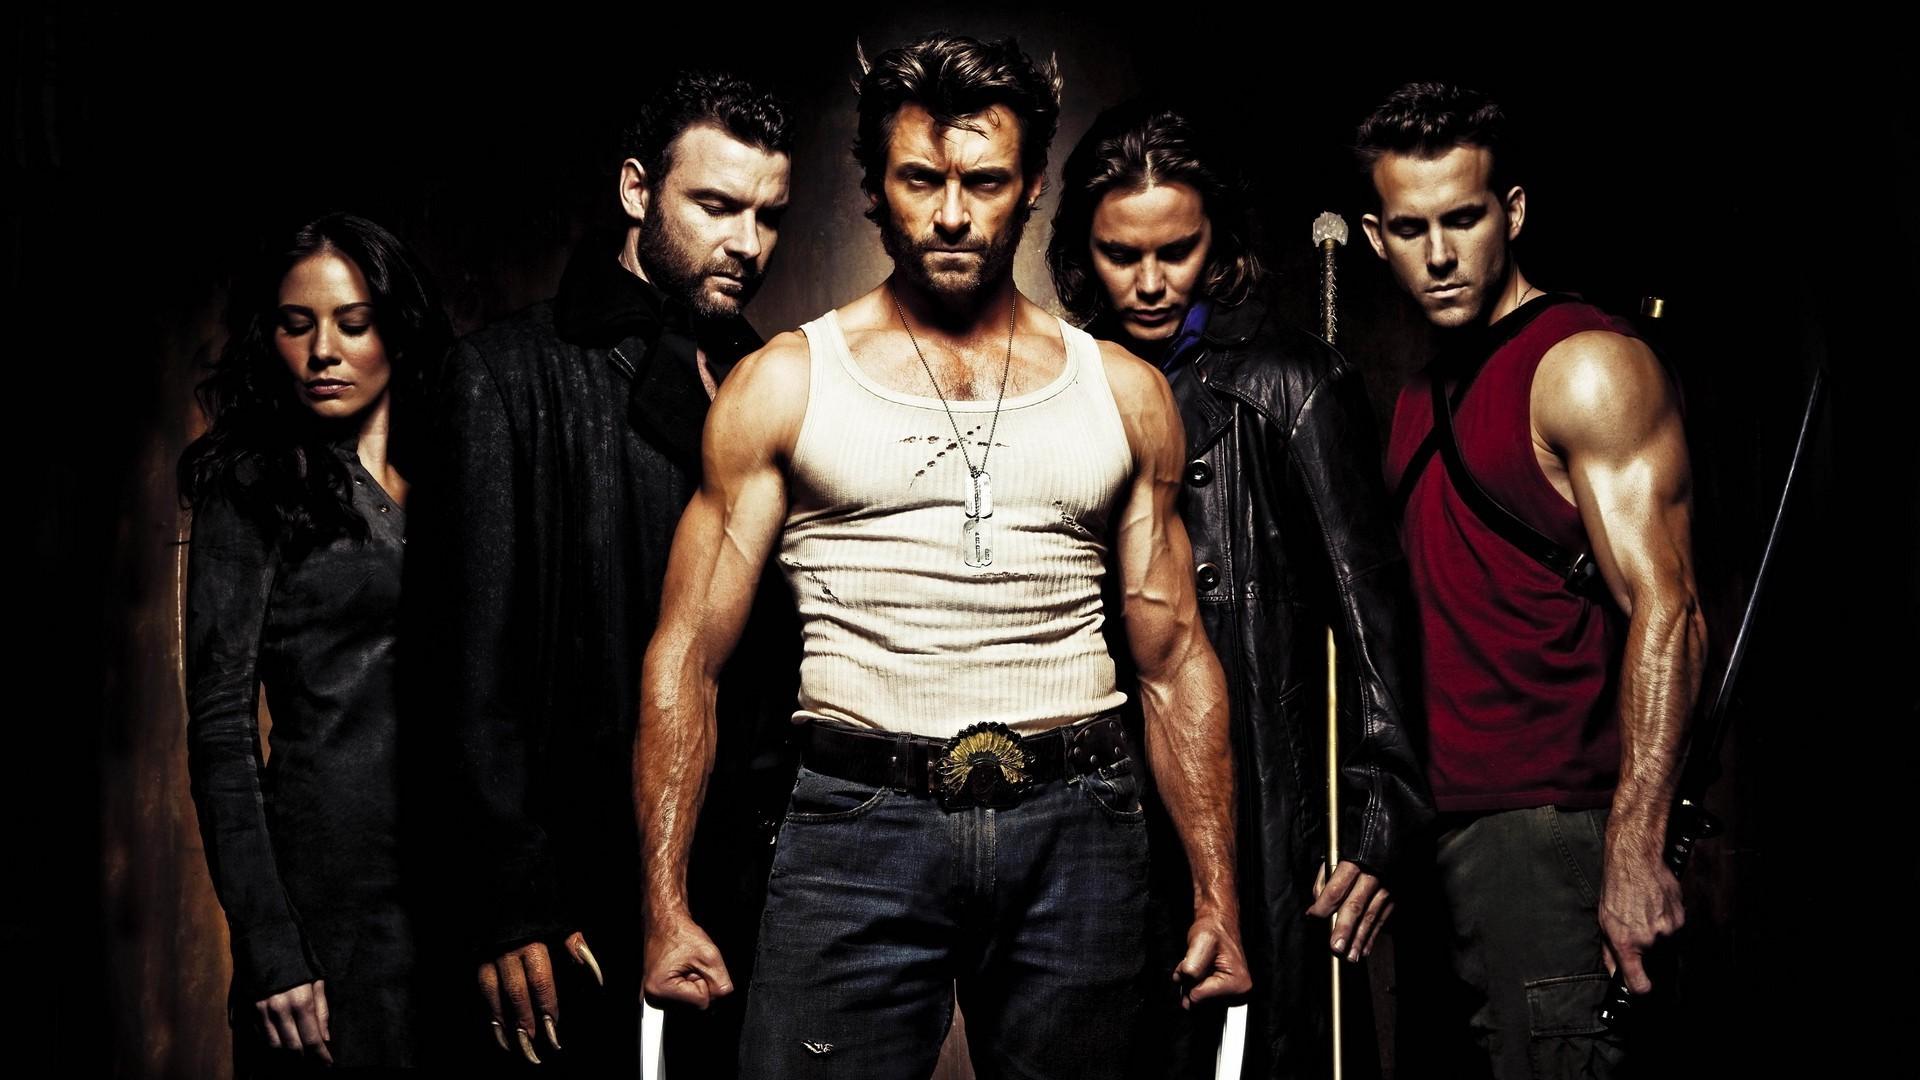 1920x1080 Px Deadpool Hugh Jackman Kayla Silverfox Ryan Reynolds Sabretooth X Men Origins Wolverine